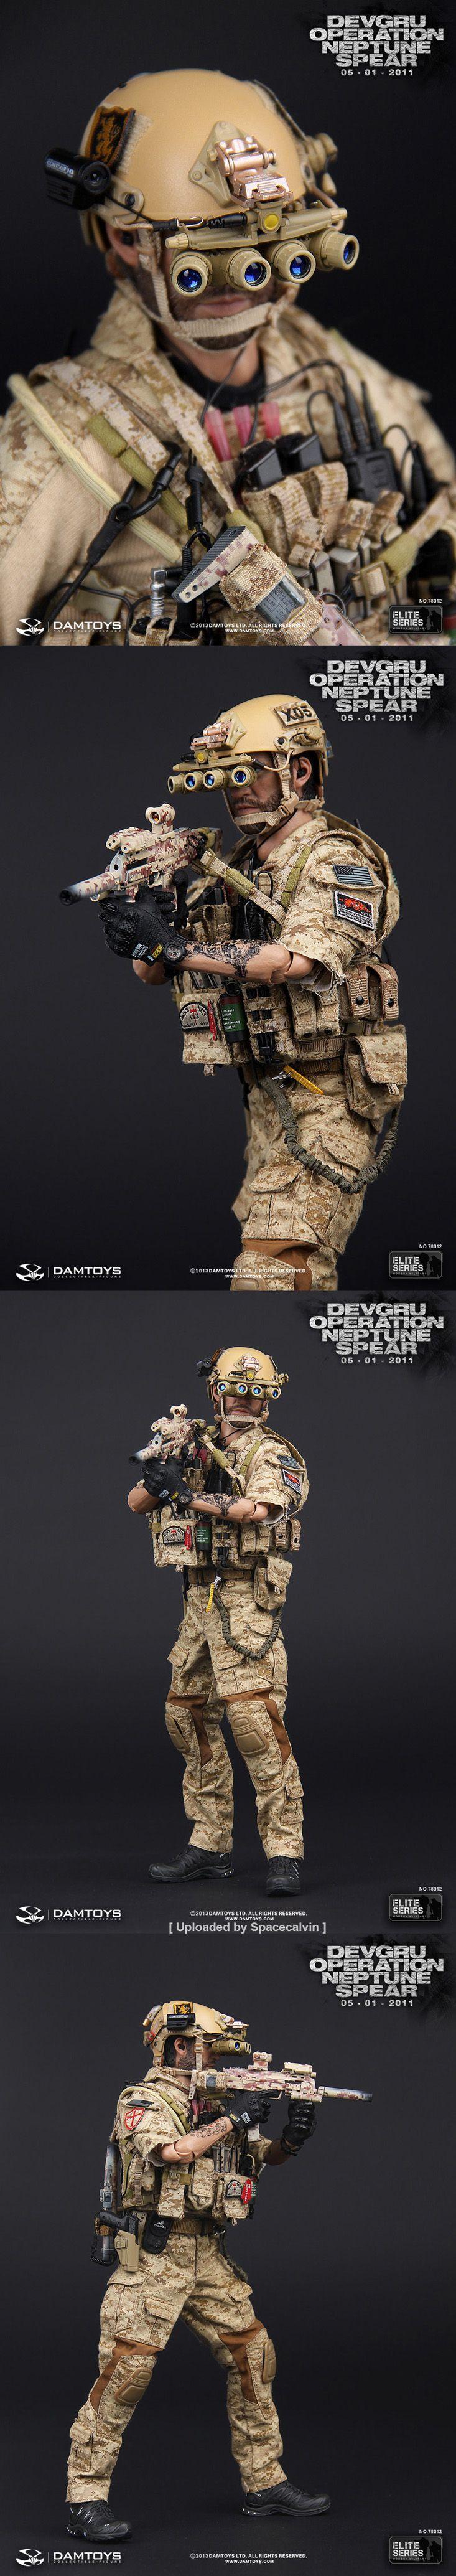 [DAMTOYS]_78012_DEVGRU Operation Neptune Spear